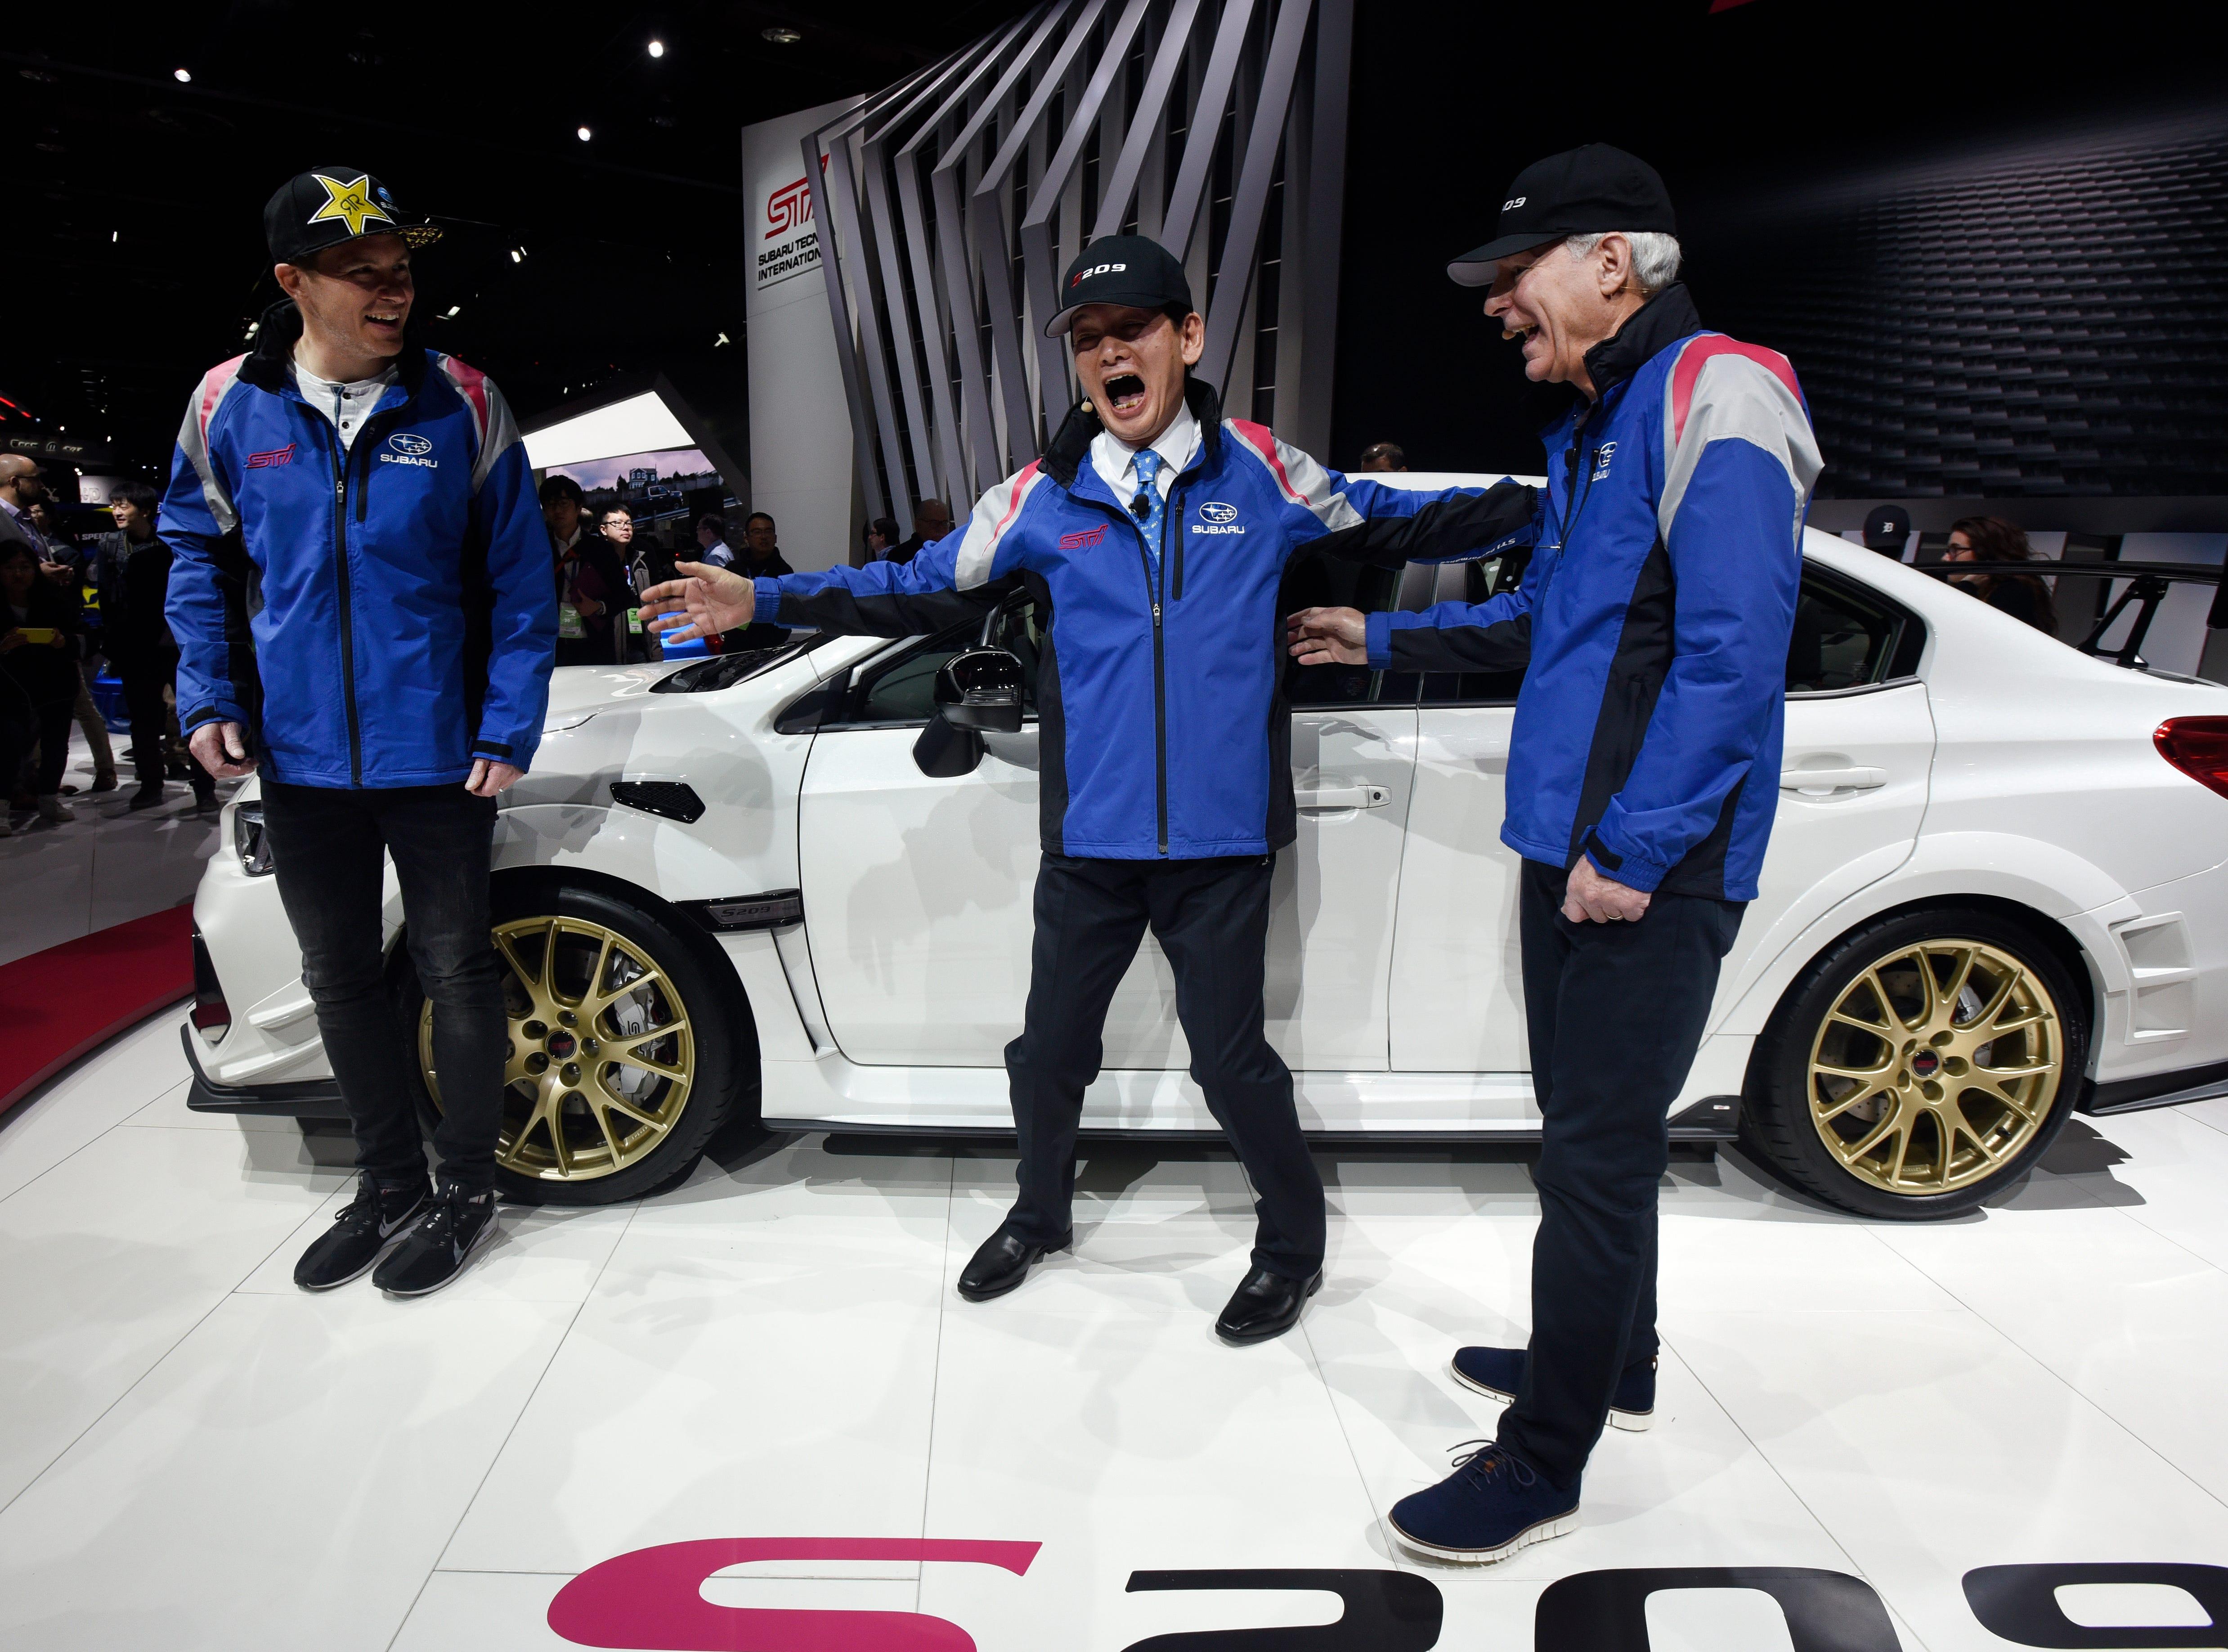 Subaru Motorsports driver Scott Speed, left, Subaru Tecnica International President Yoshio Hirakawa and Subaru of America Inc. President CEO Tom Doll share a laugh following the unveiling of the STI S209.